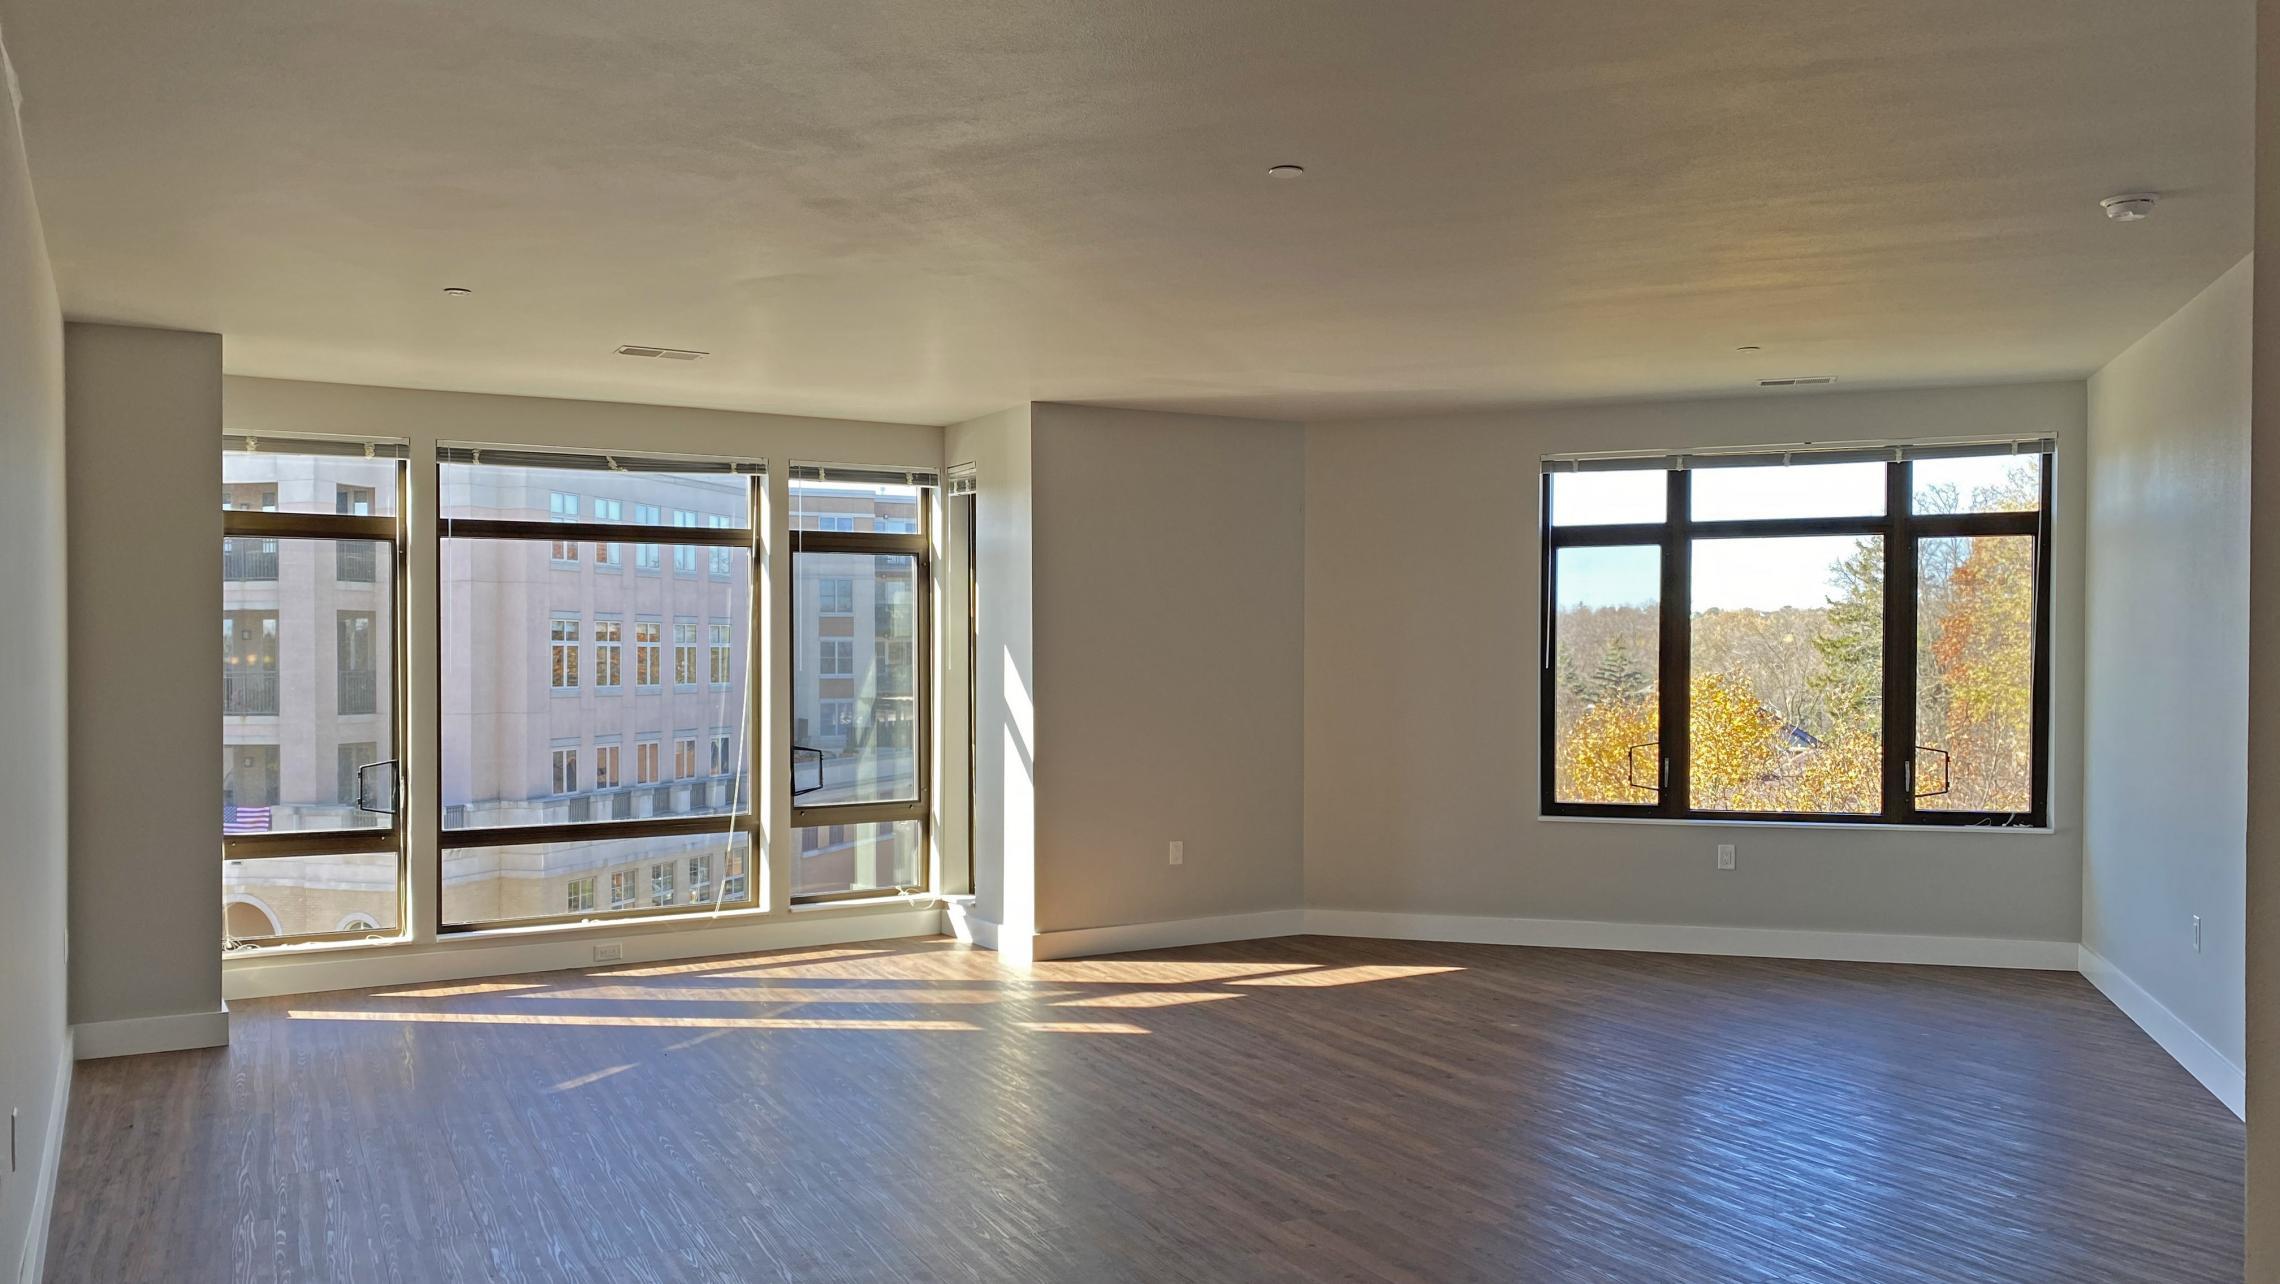 1722-Monroe-Apartments-419-Three-Bedroom-Modern-Upscale-Design-Windows-Natural-Light-Gym-Terrace-Living-Luxury-Lounge-Madison-Living-Space-Entertaining